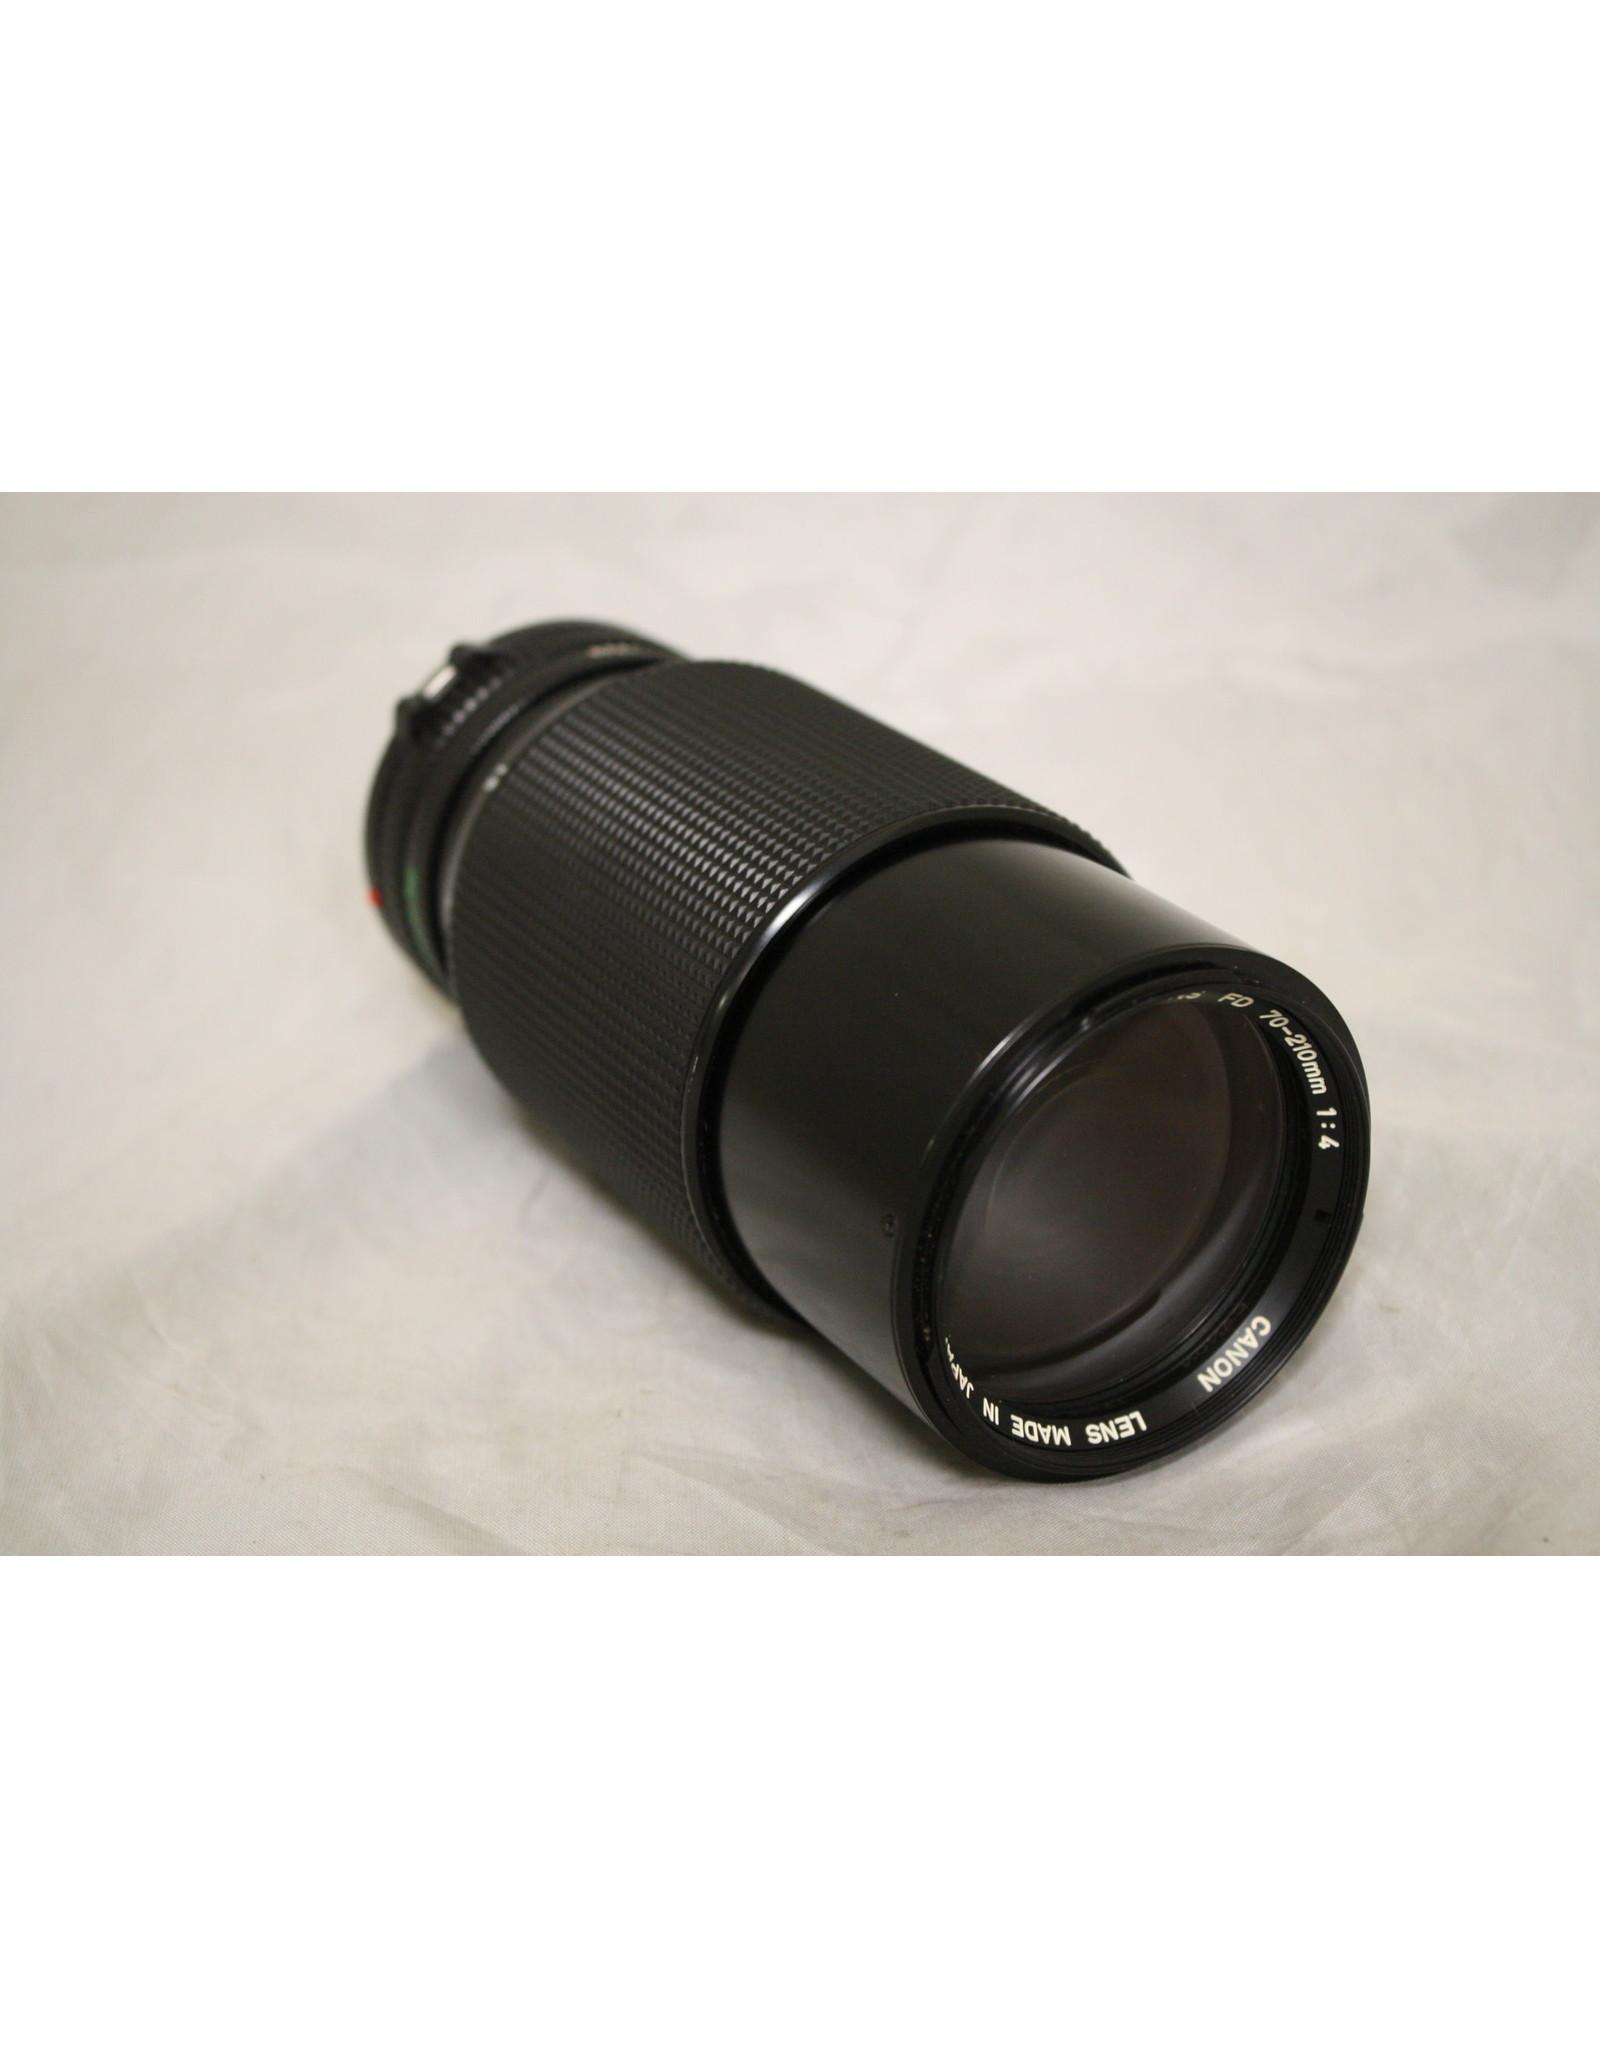 Canon 70-210mm Zoom Lens - 1:4 Film Camera Lens